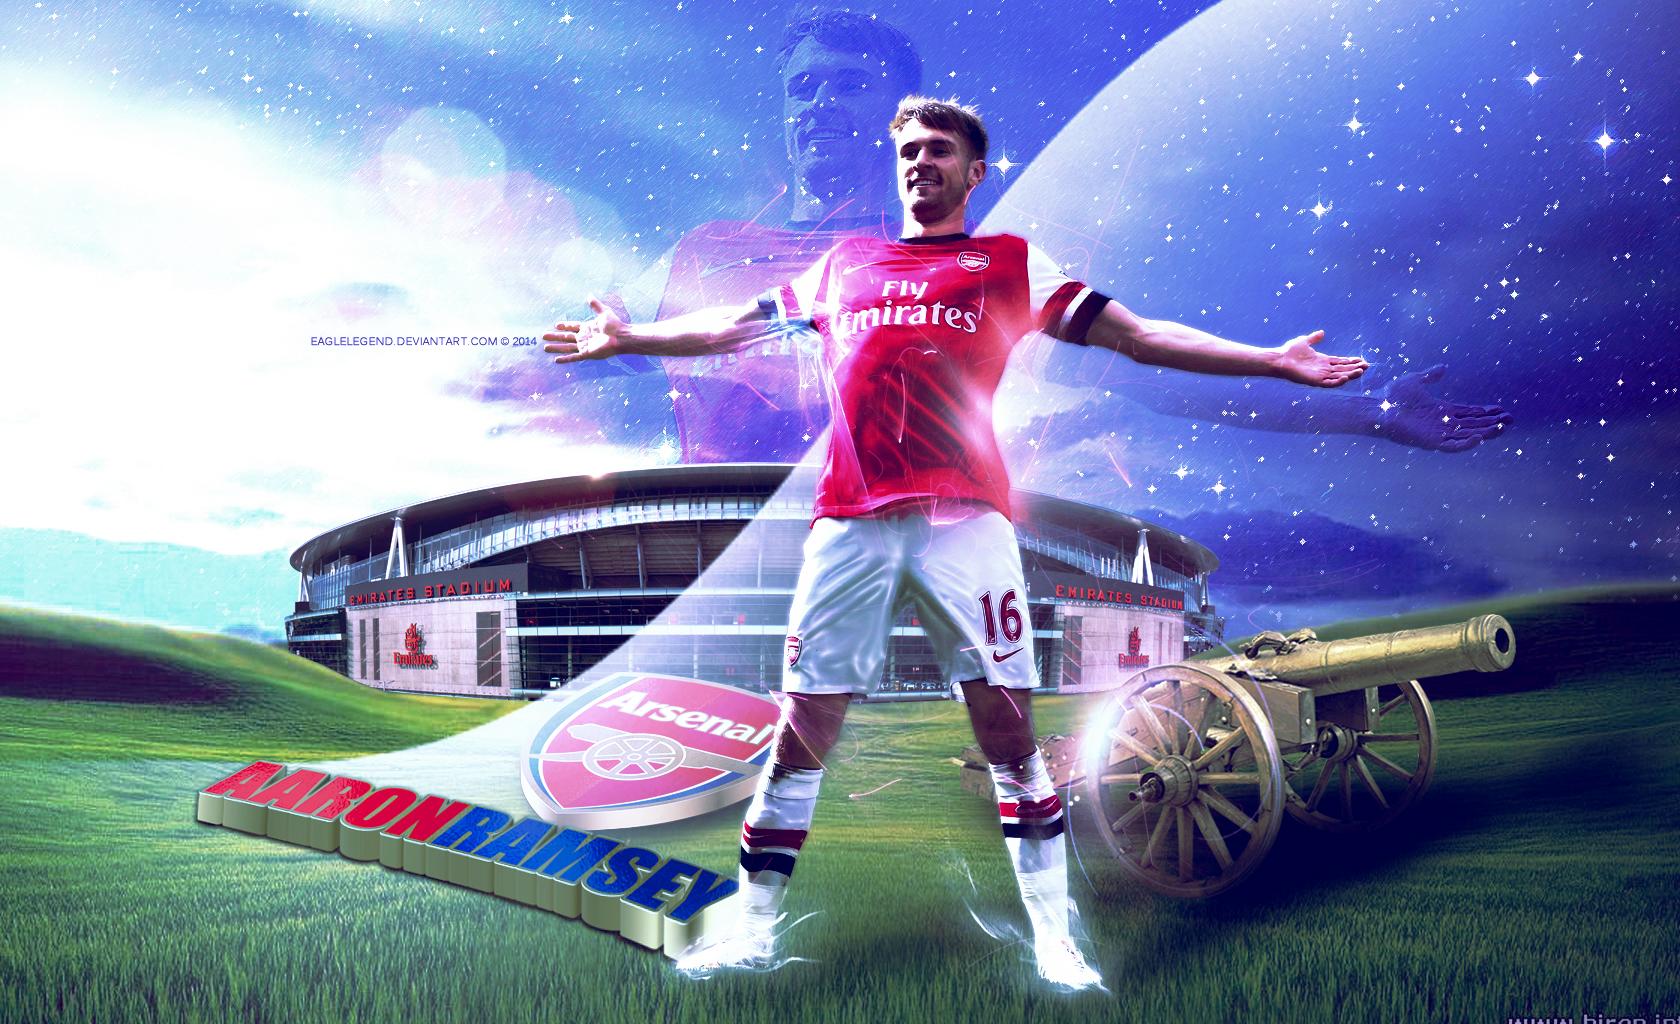 Aaron Ramsey Arsenal Wallpaper 2014 1jpg 1680x1024